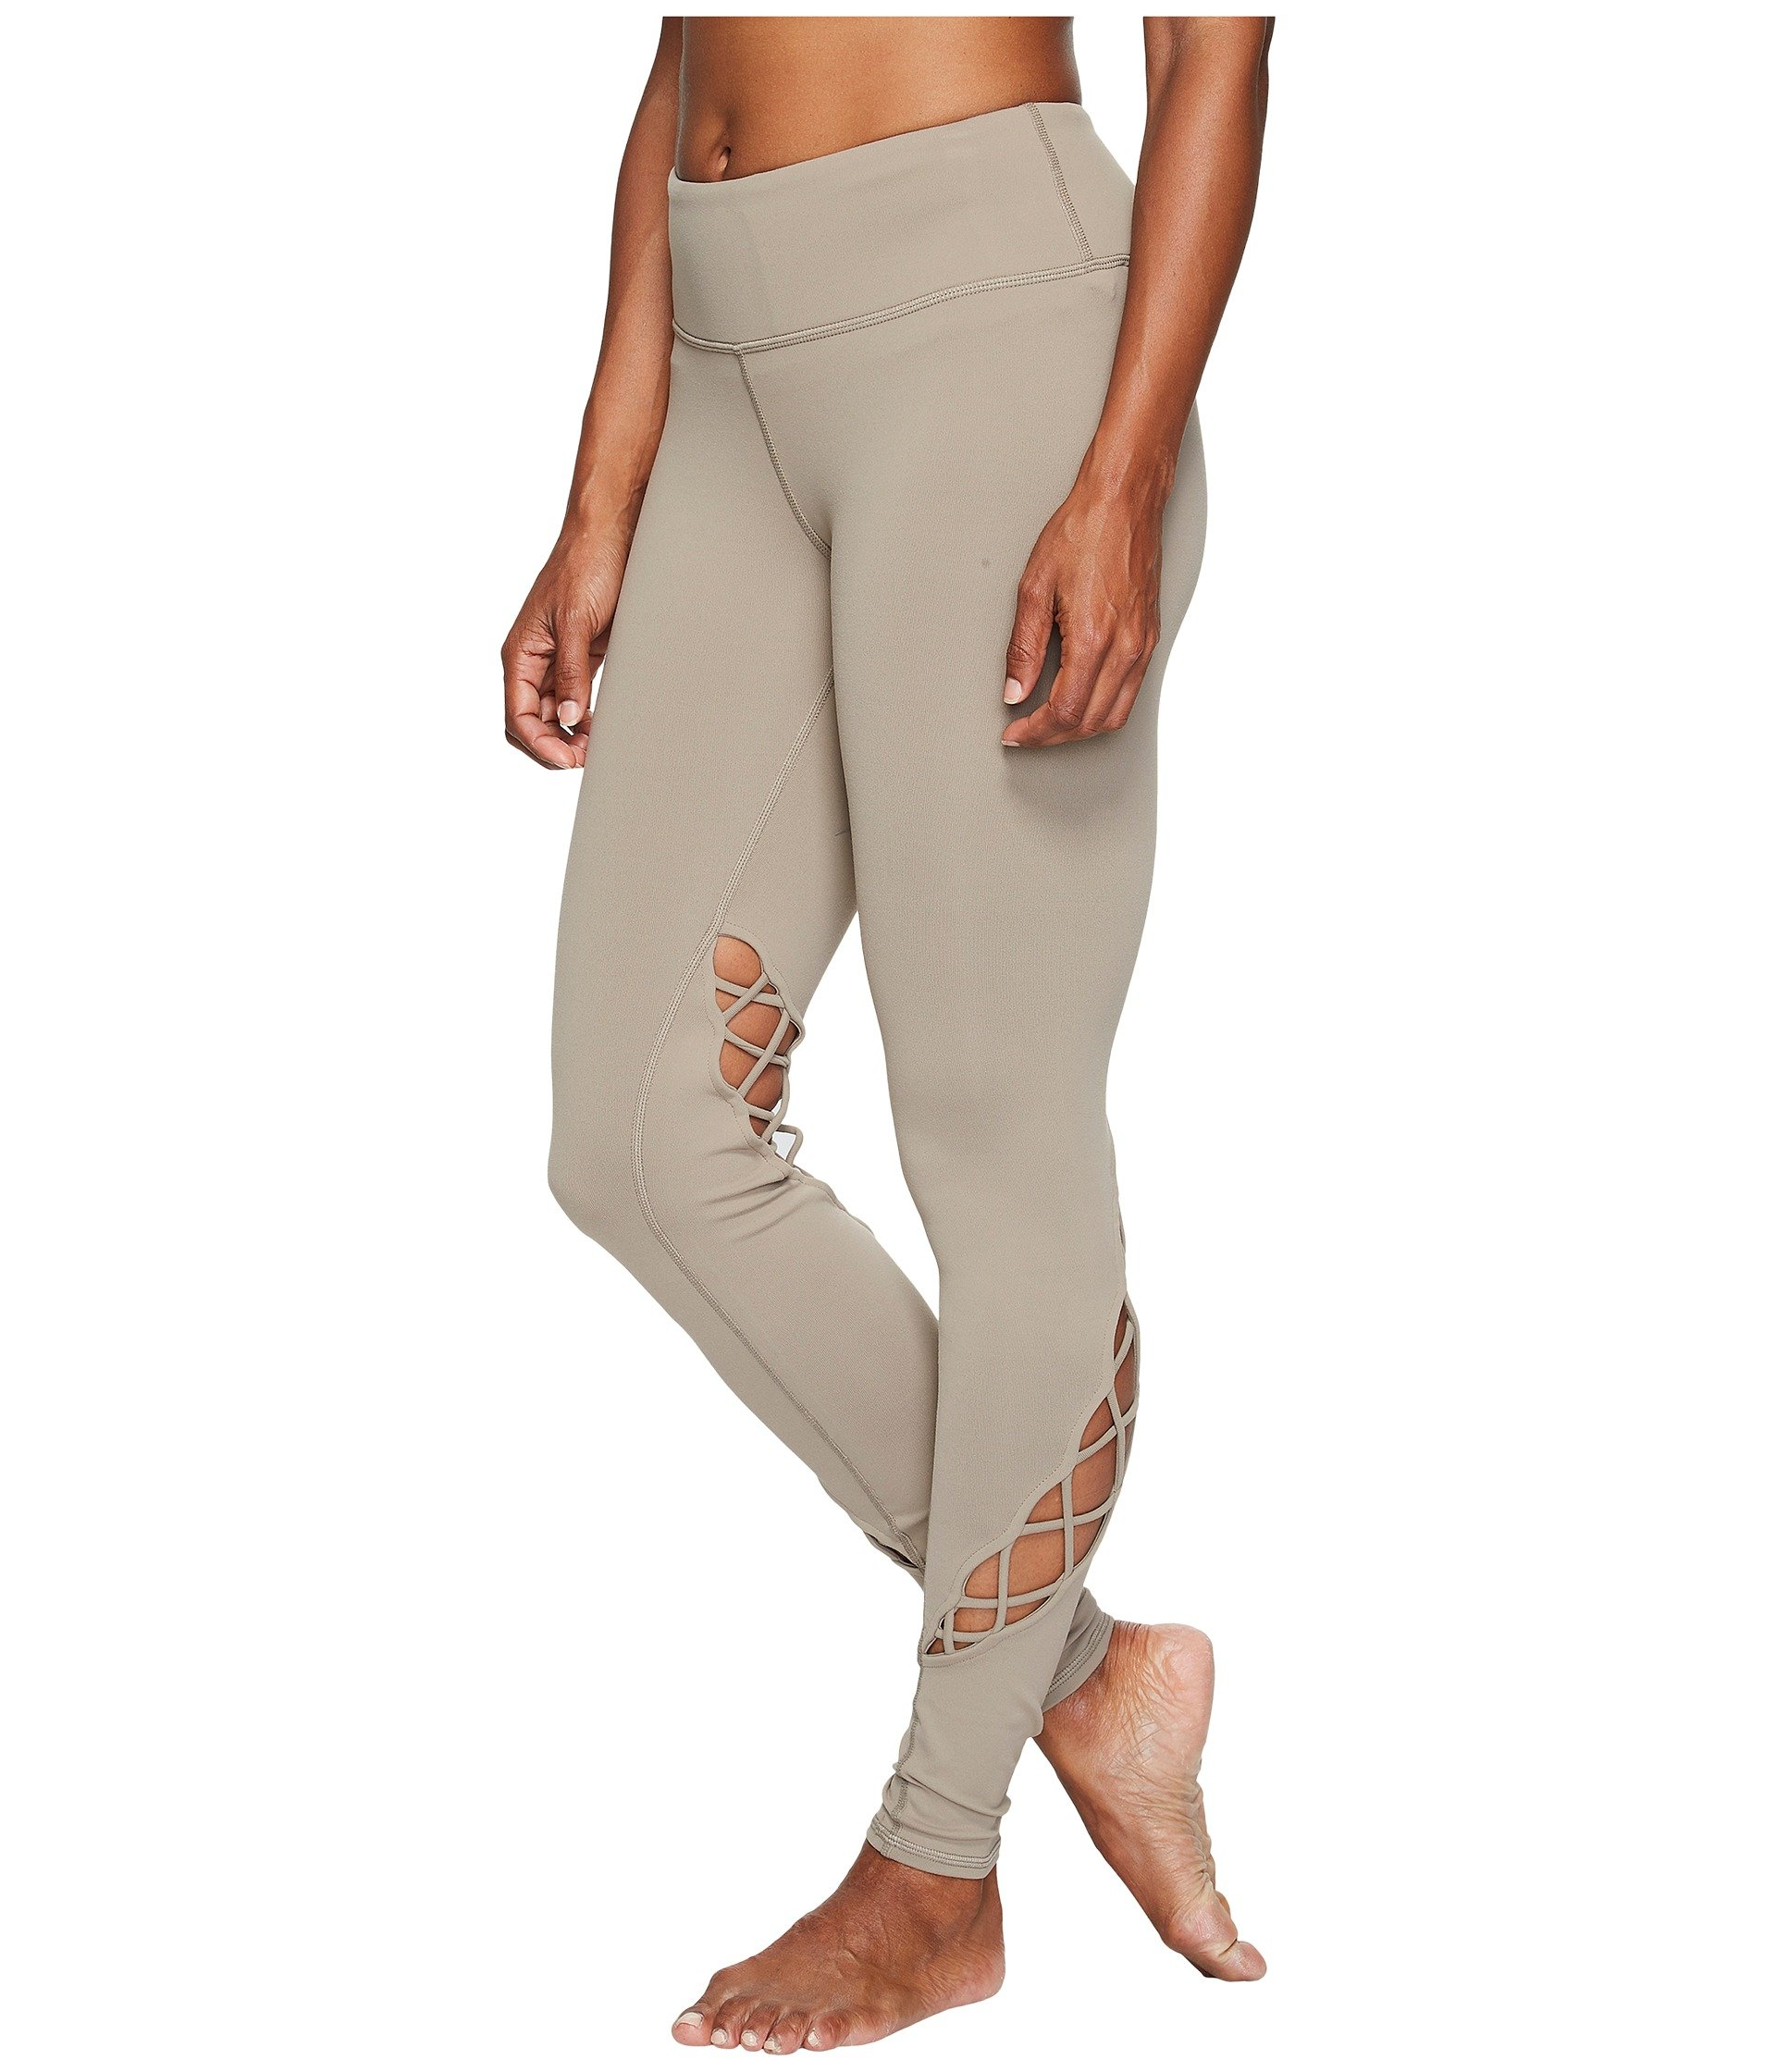 Alo Yoga Women's Entwine Legging, Gravel XXS